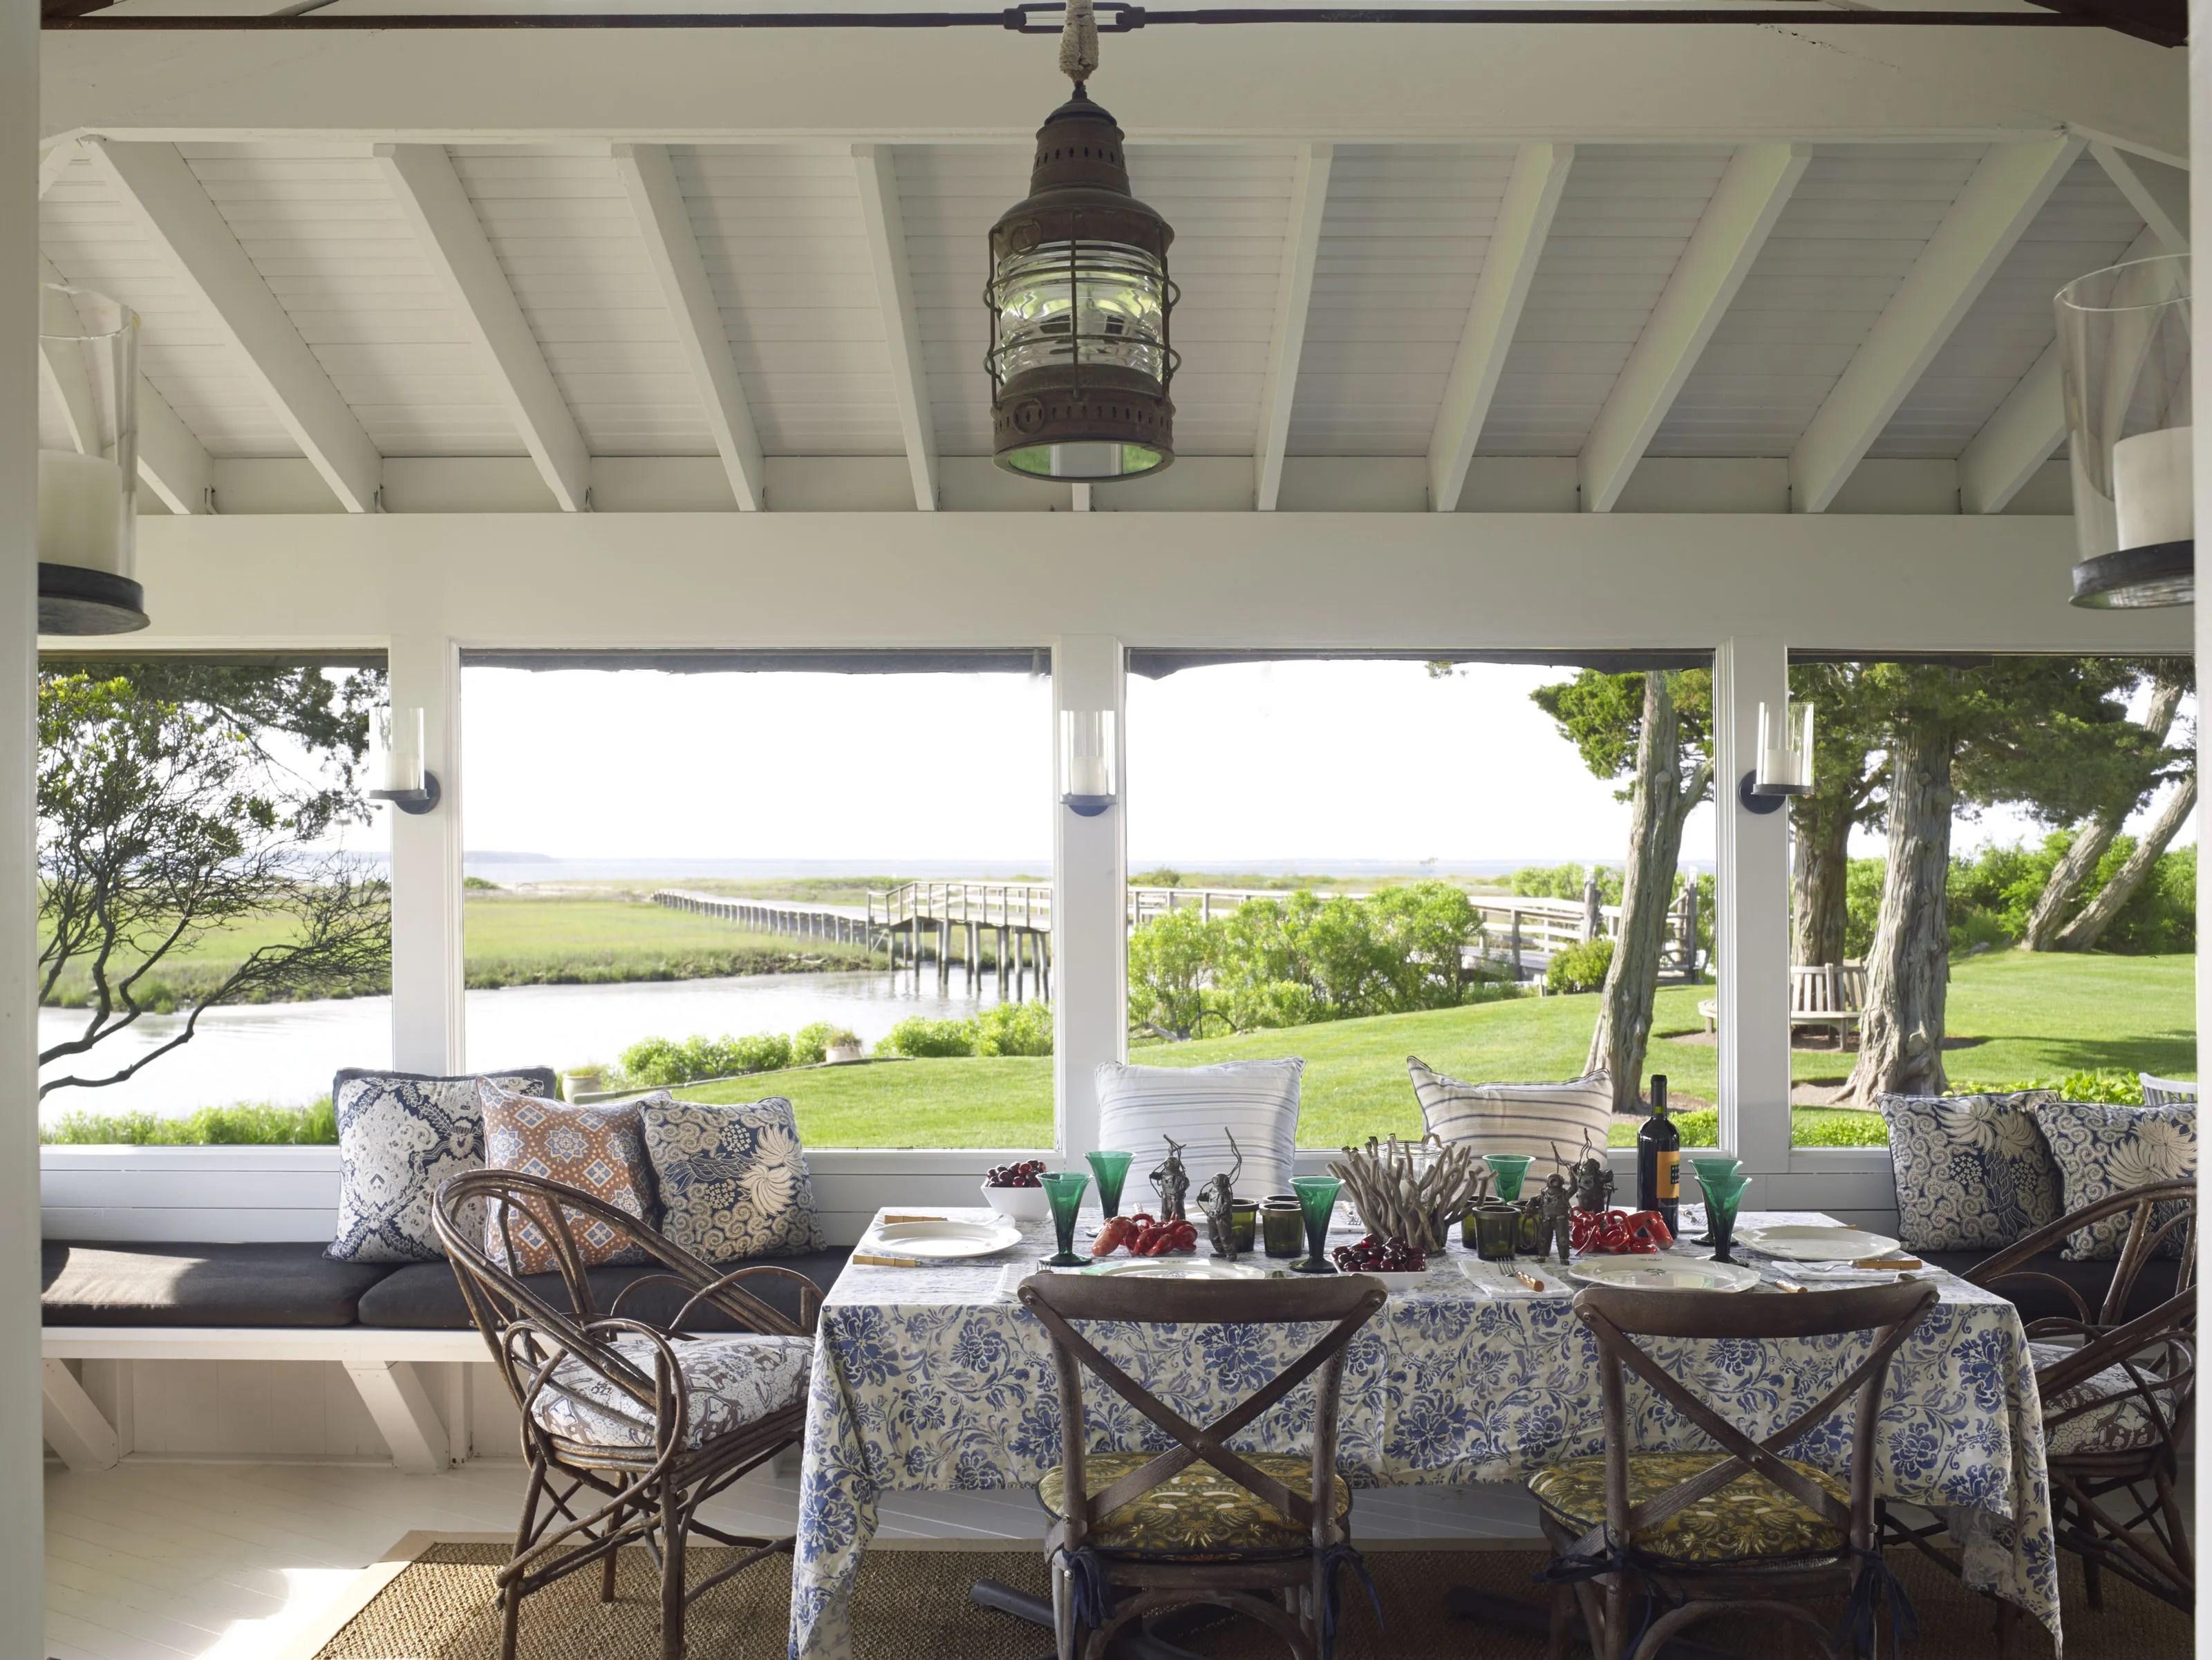 Outdoor Patio Ideas from Stunning Hamptons Homes Photos ... on Backyard Patio Designs  id=93967